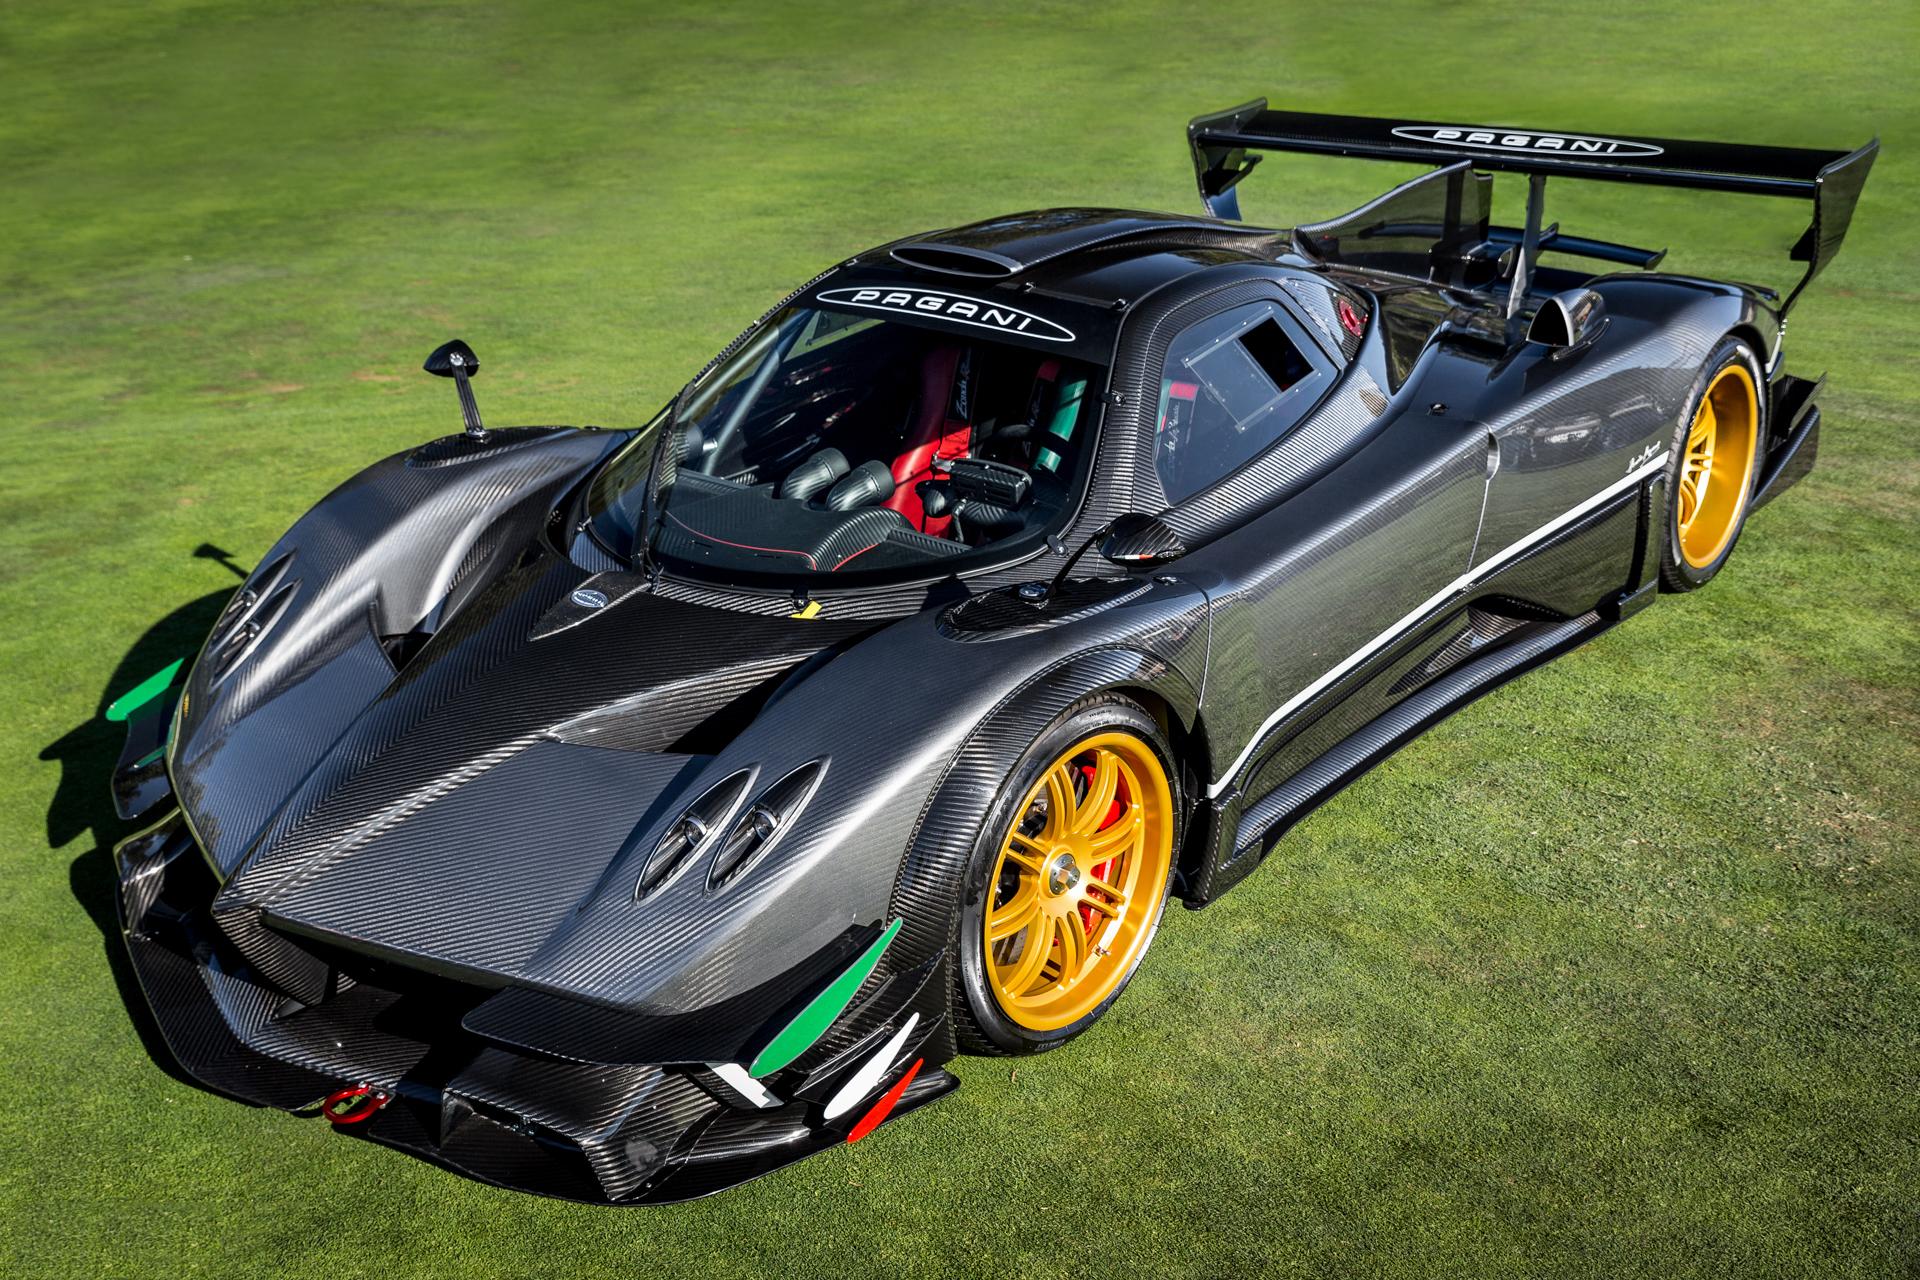 El Black Minion de Pablo Pérez Companc acelera 350 kilómetros por hora gracias a sus 800 caballos de potencia